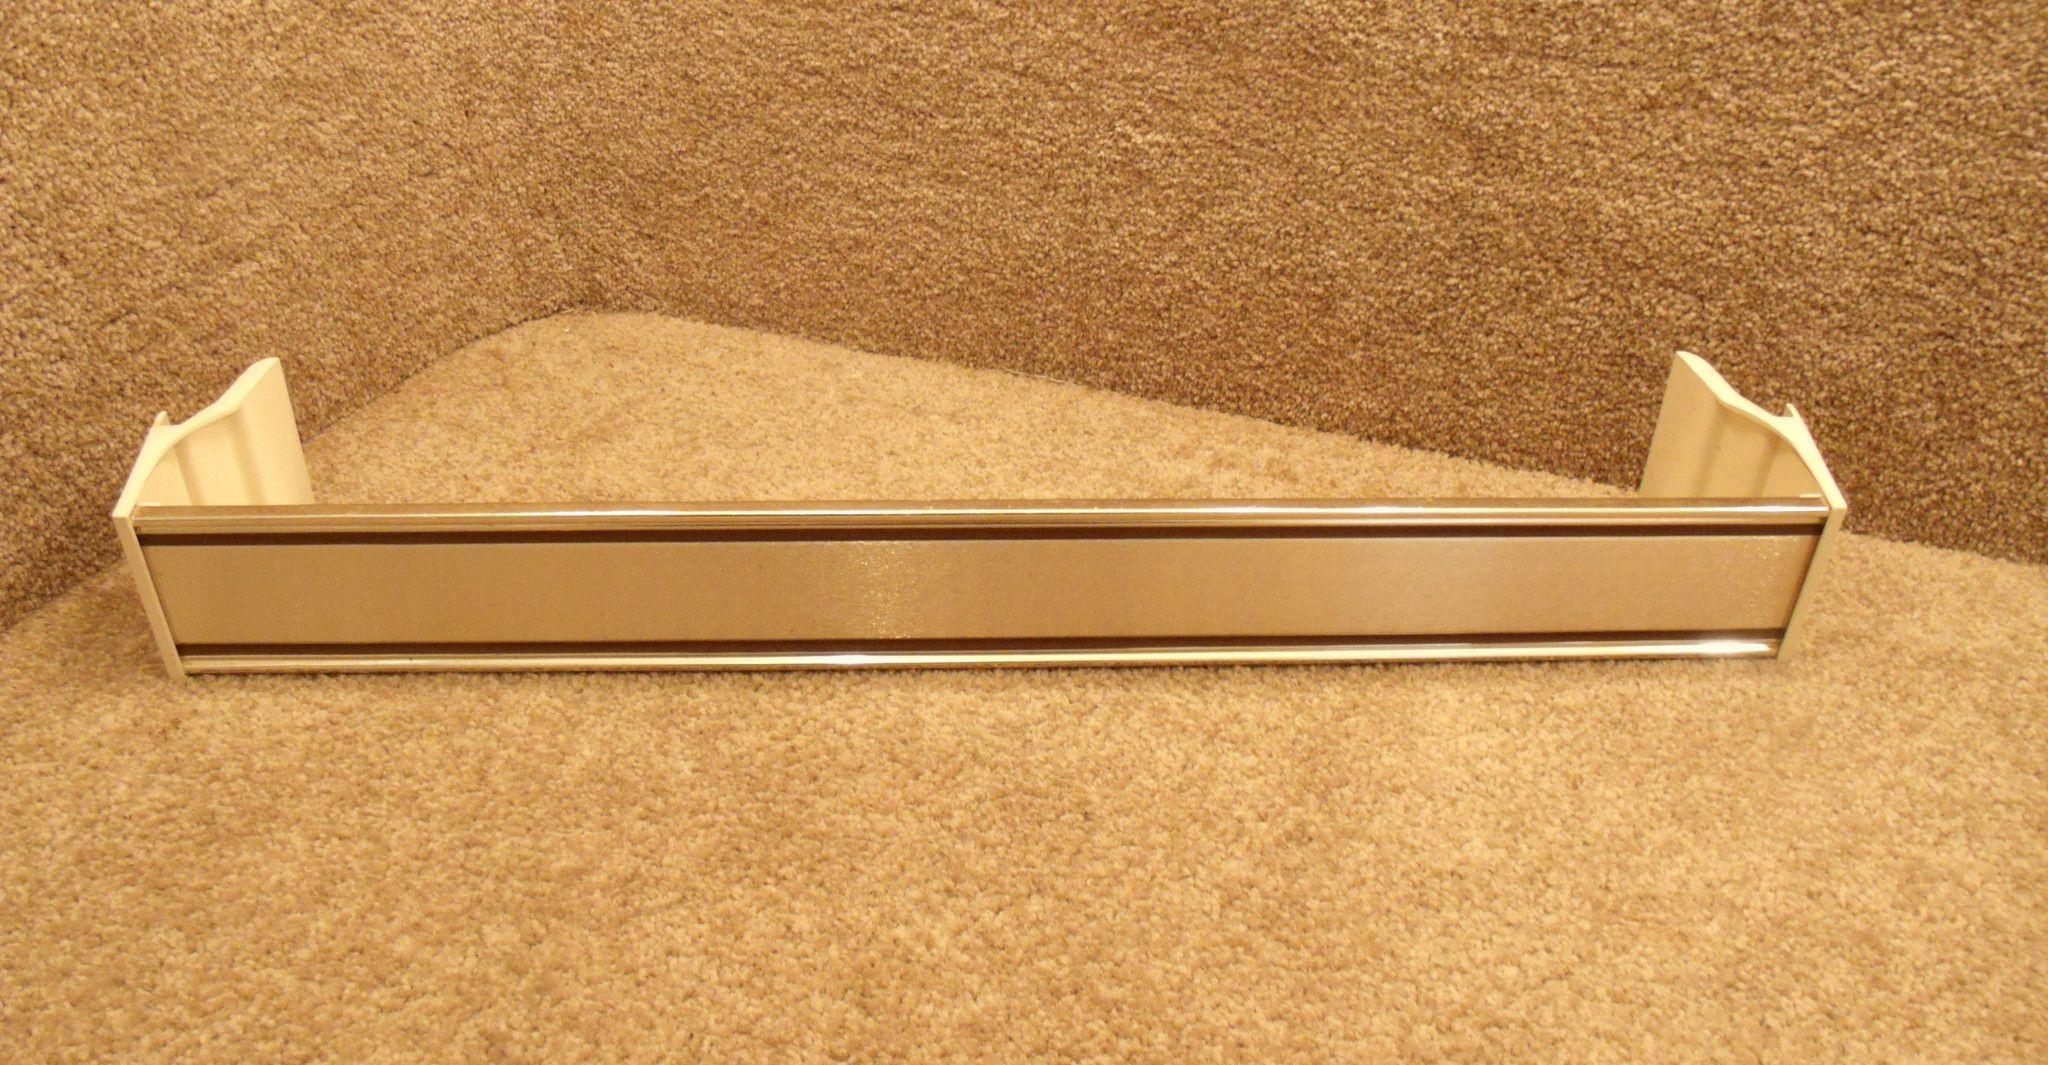 G164109 22 Gibson Frigidaire Refrigerator Door Shelf